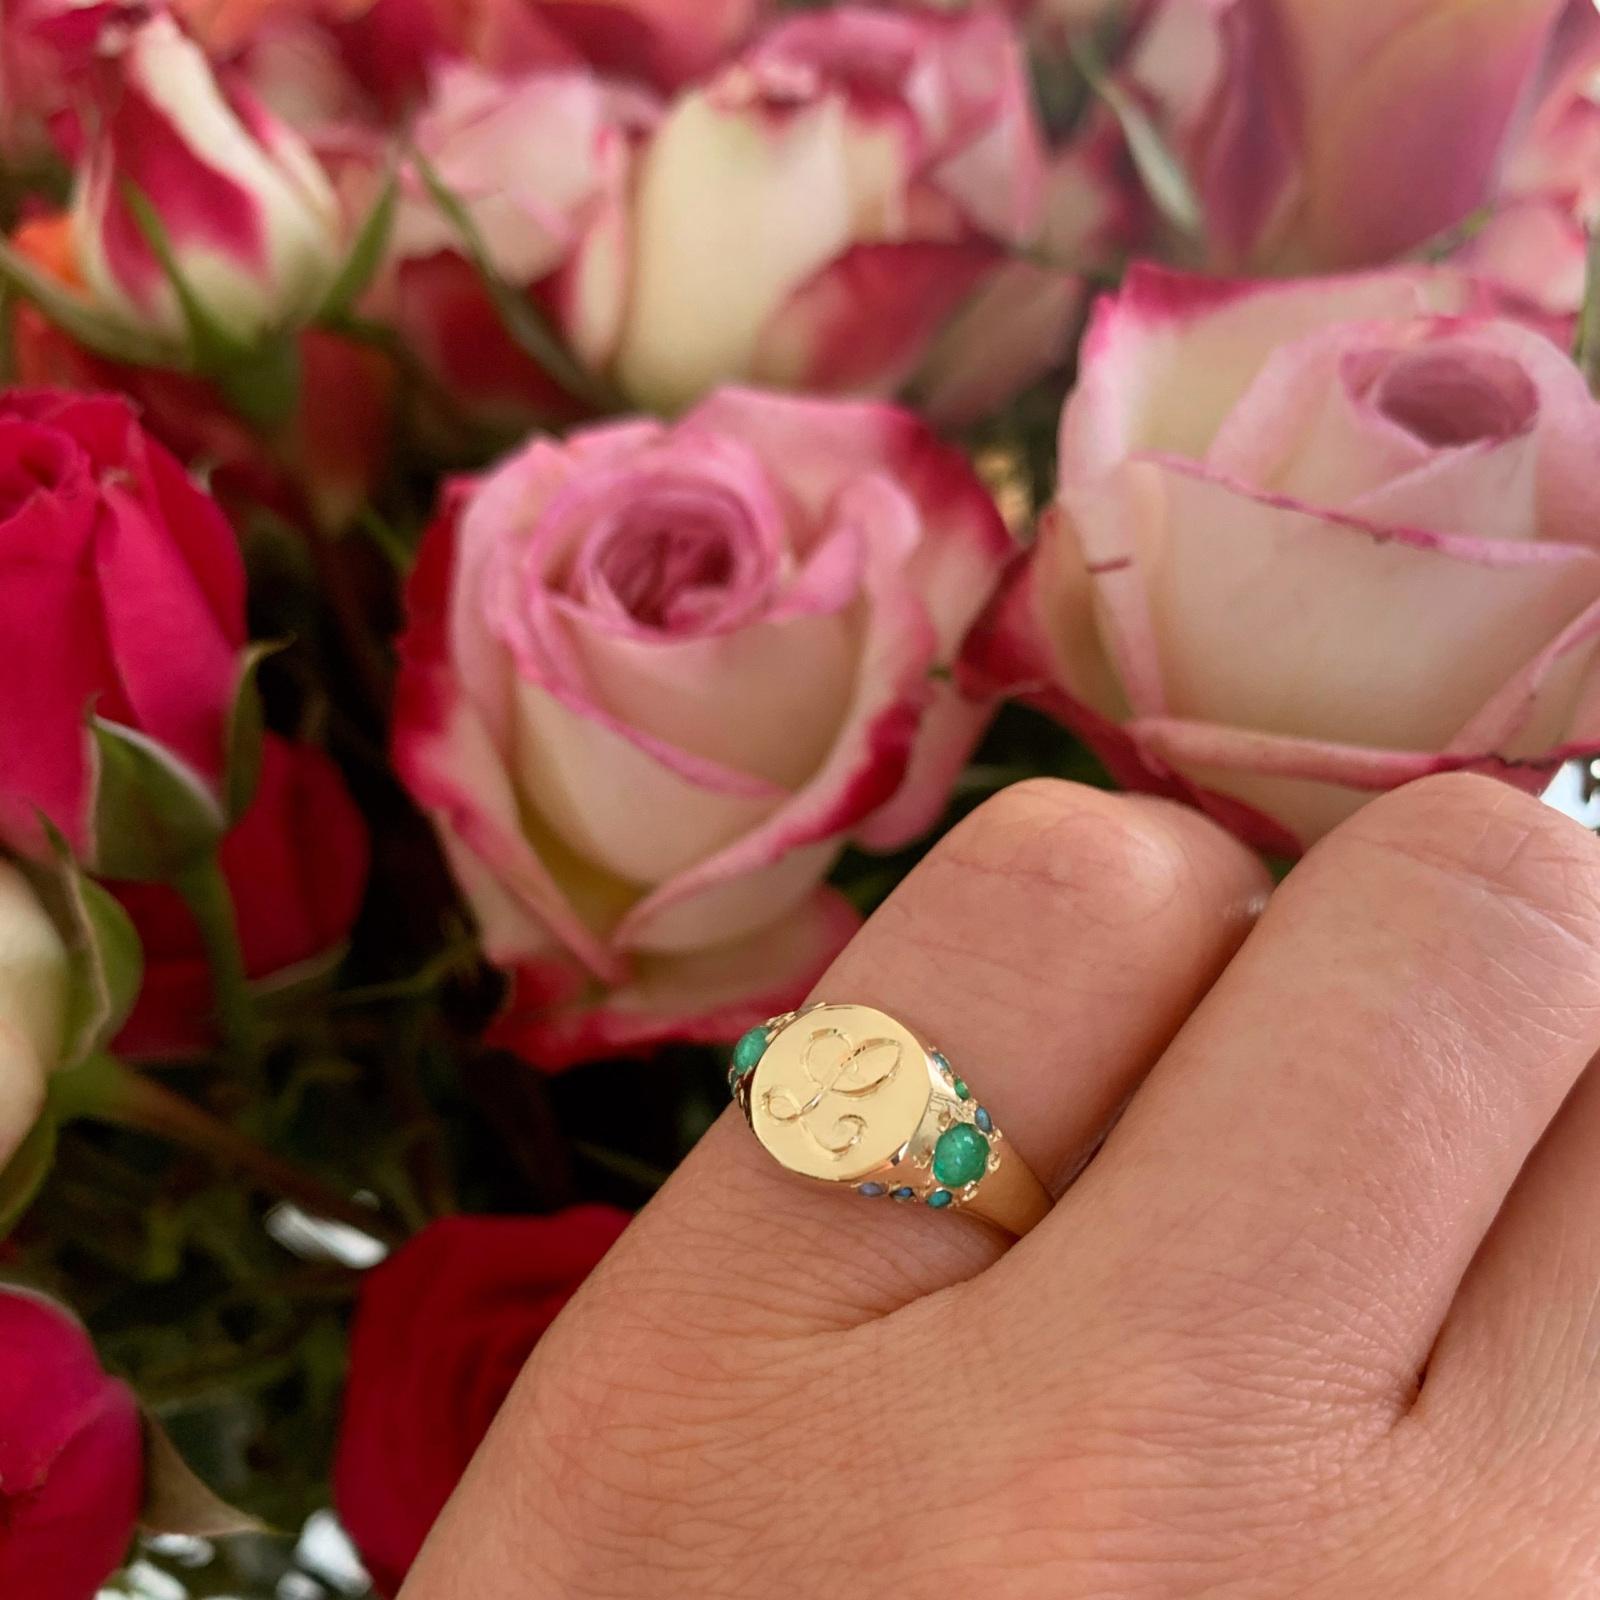 spring new ring custom large signet ring